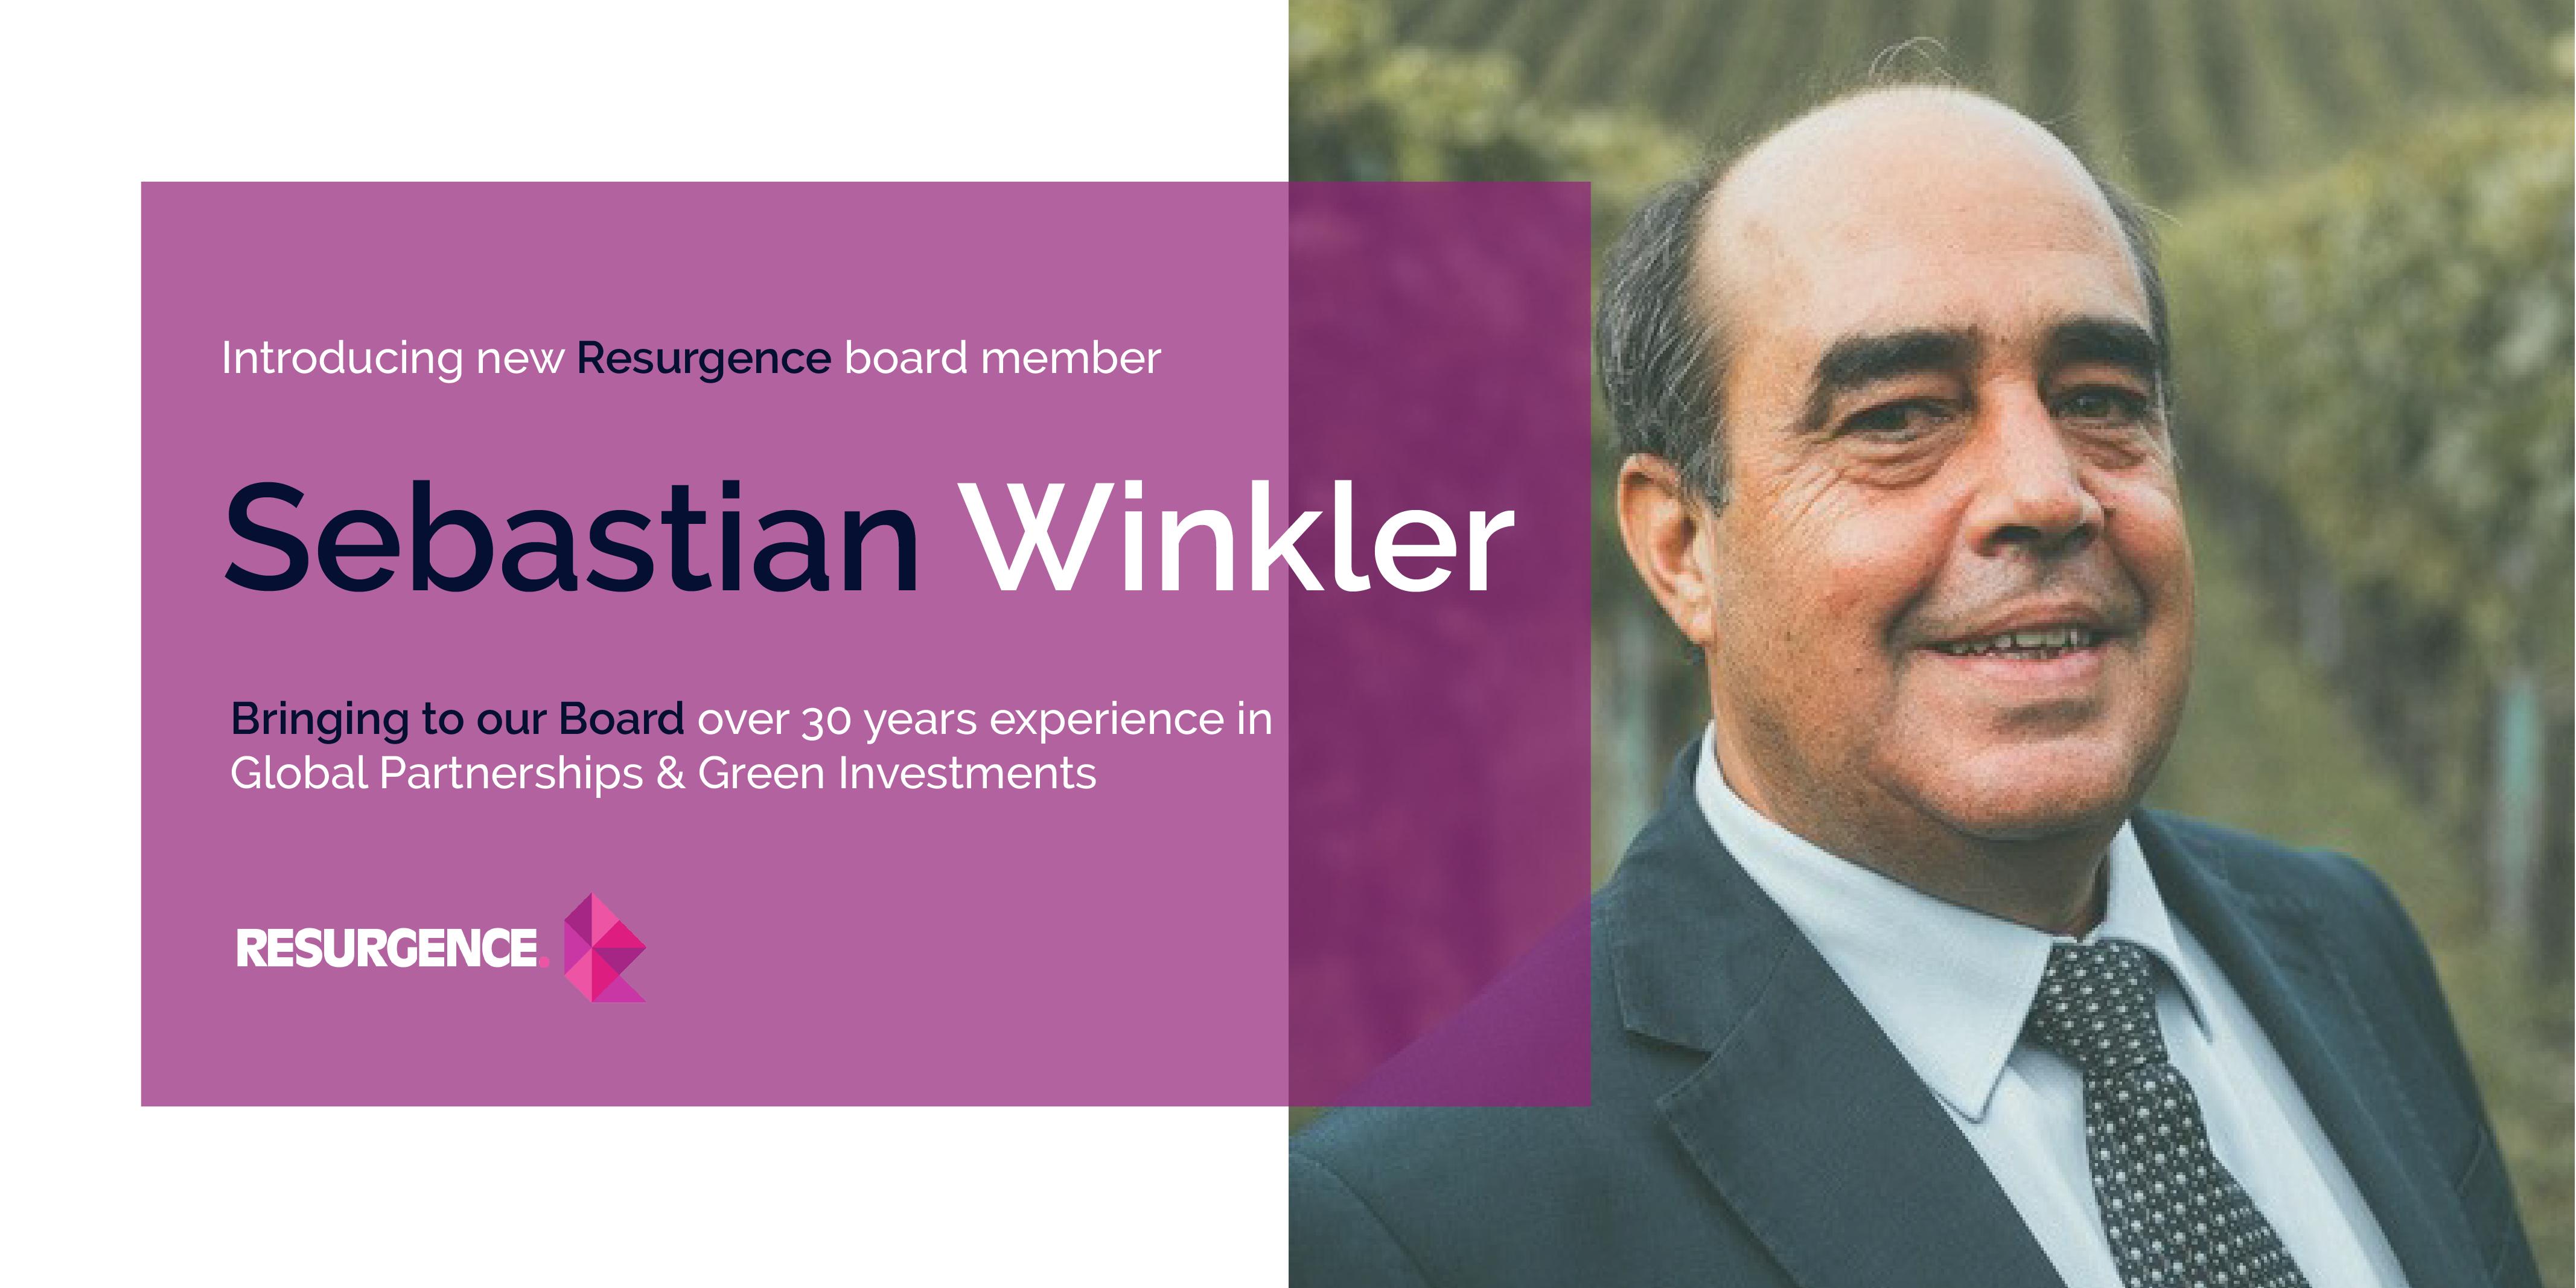 Resurgence welcomes Sebastian Winkler, Senior Advisor to the UN's Nature Based Solutions to the Board